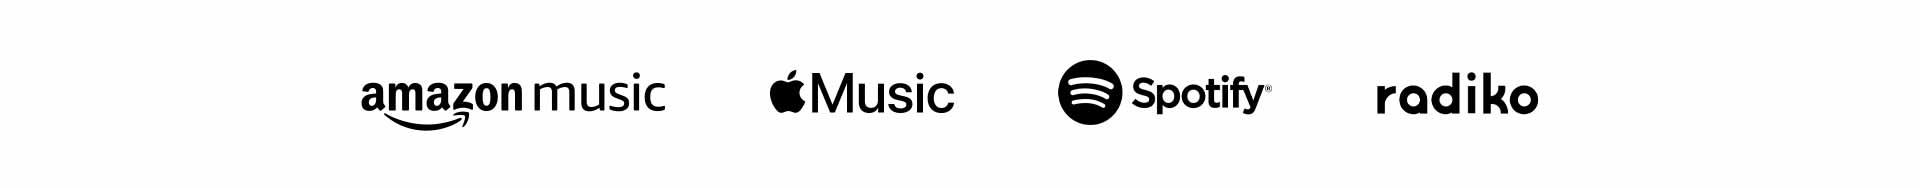 Amazon music, Apple Music, TuneIn, Spotify, Dhits, Utapass